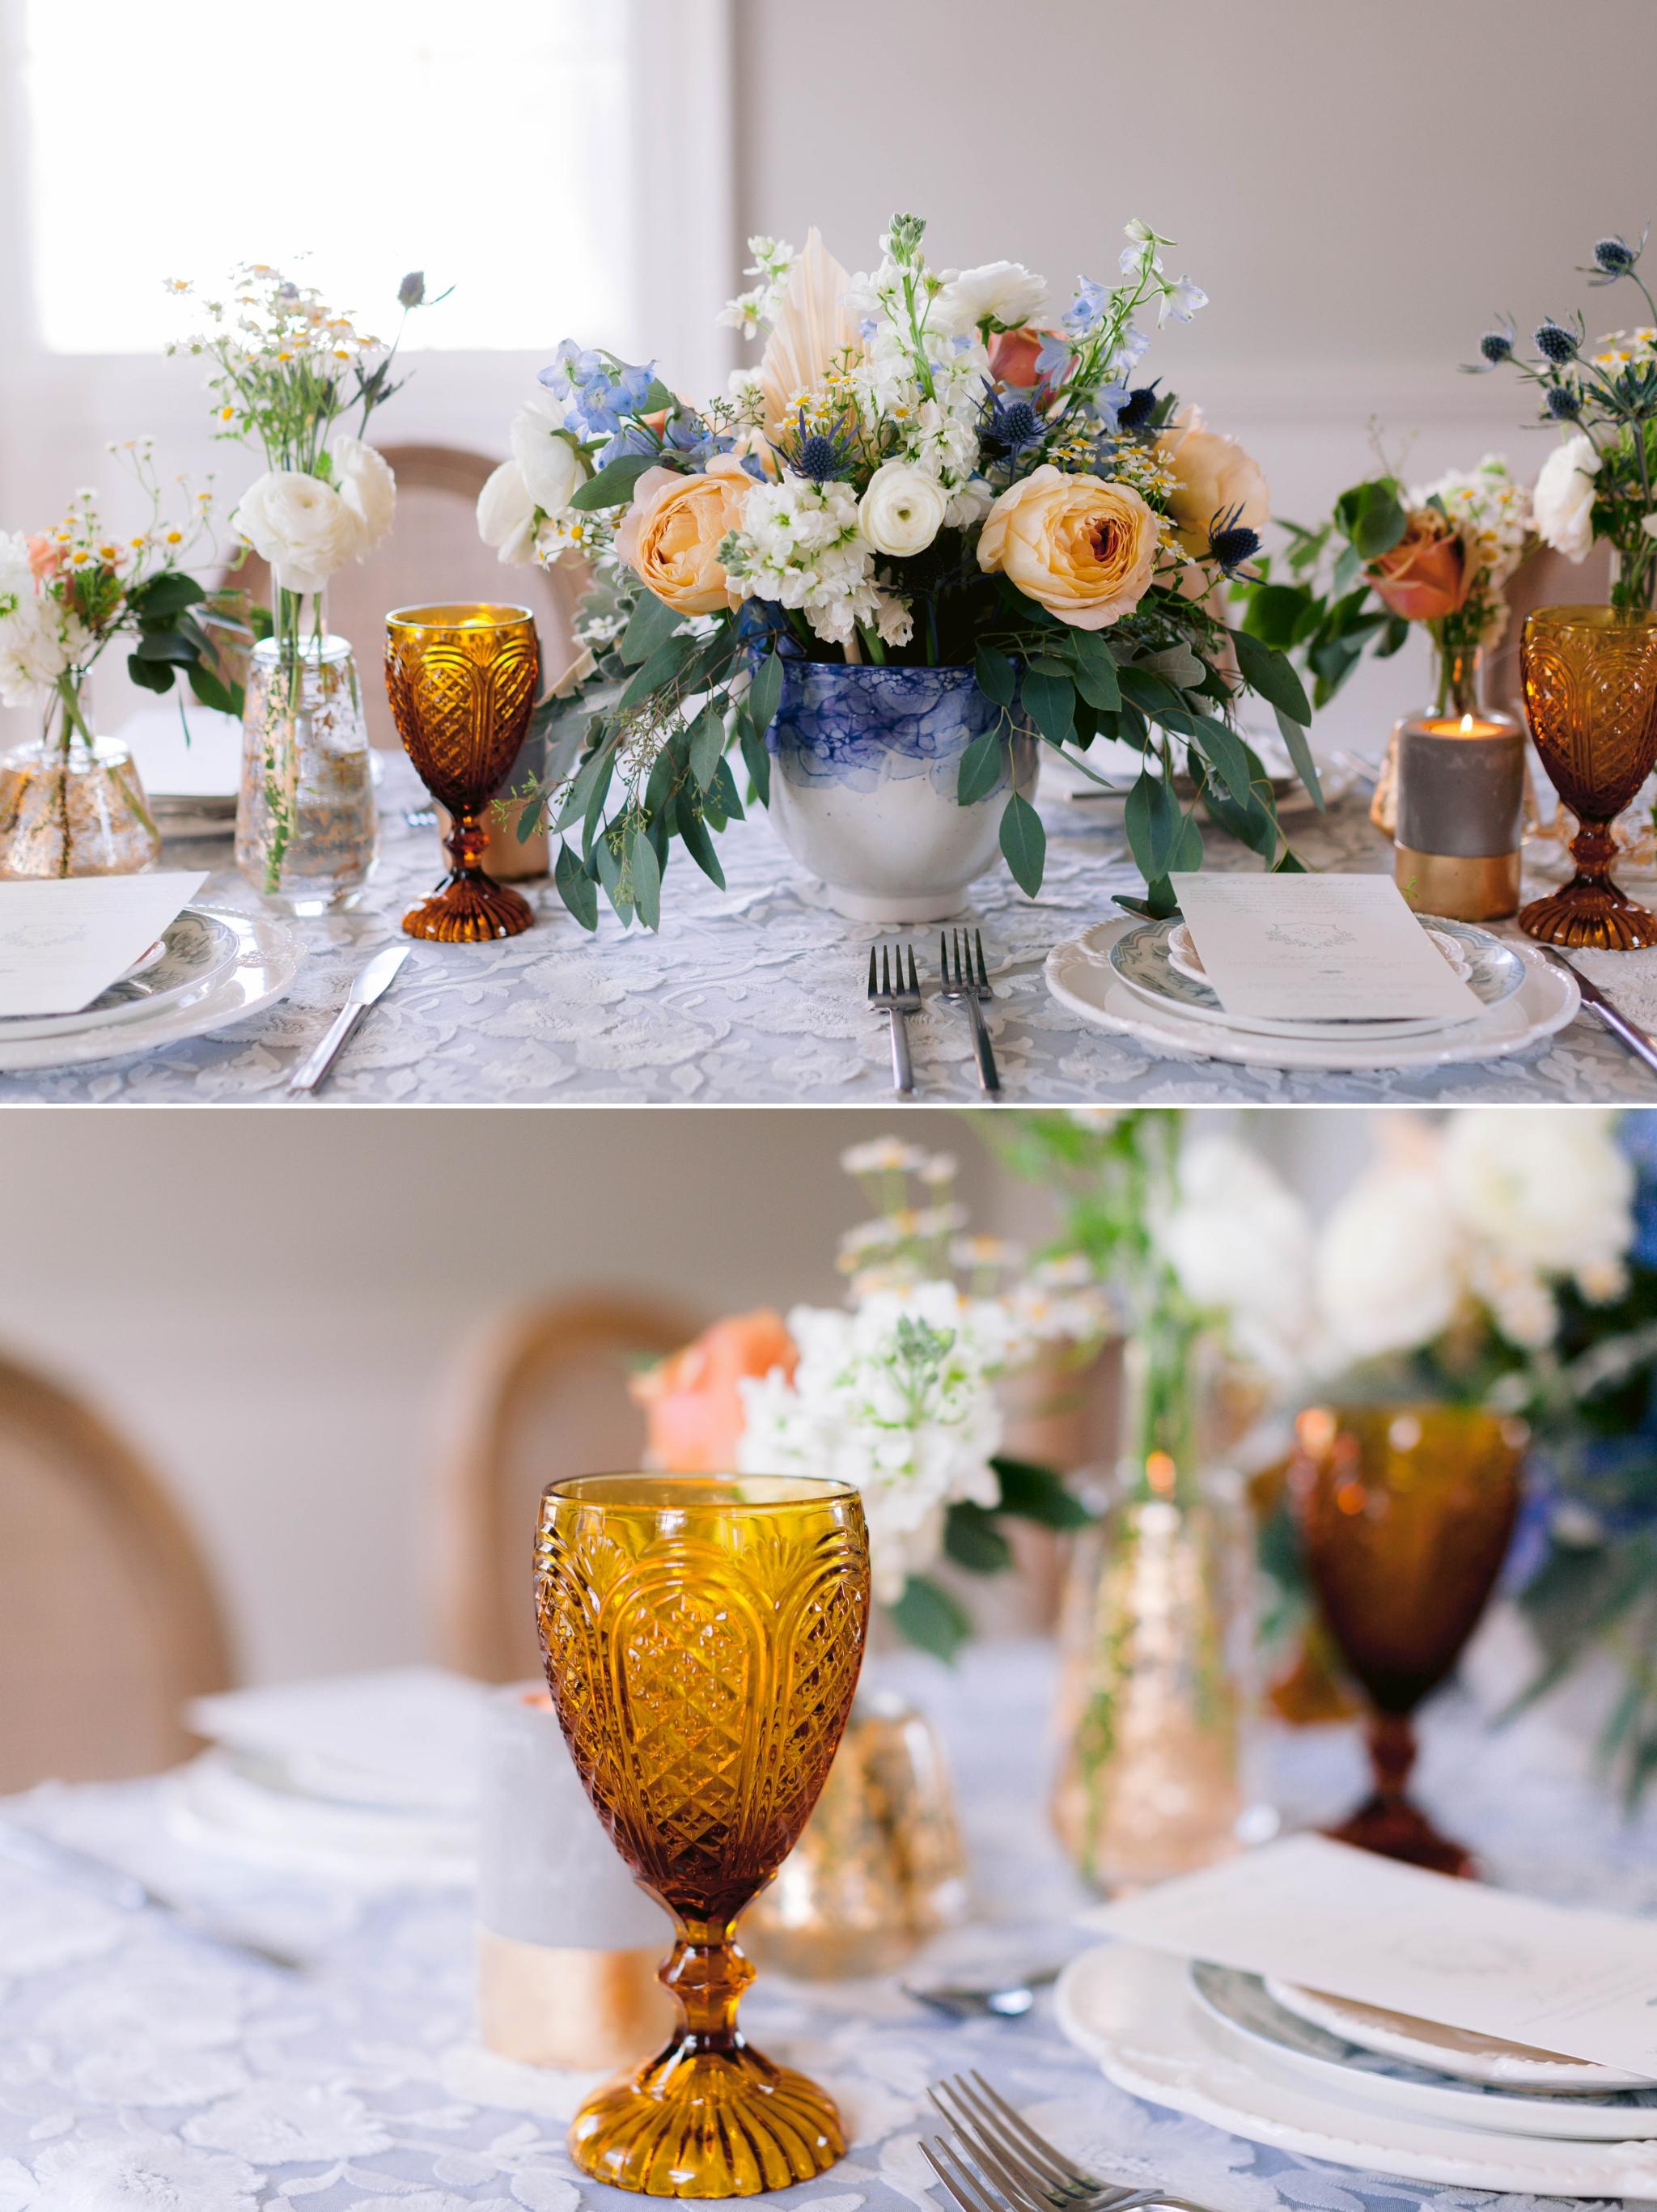 Table Set up with white and blue tablecloth, white and pastel china and pastel flowers - yellow orange wine glass - martha stewart weddings - style me pretty - Dusty Blue Wedding Inspiration - fine art photography - Honolulu, Oahu, Hawaii Wedding Photographer - johanna dye